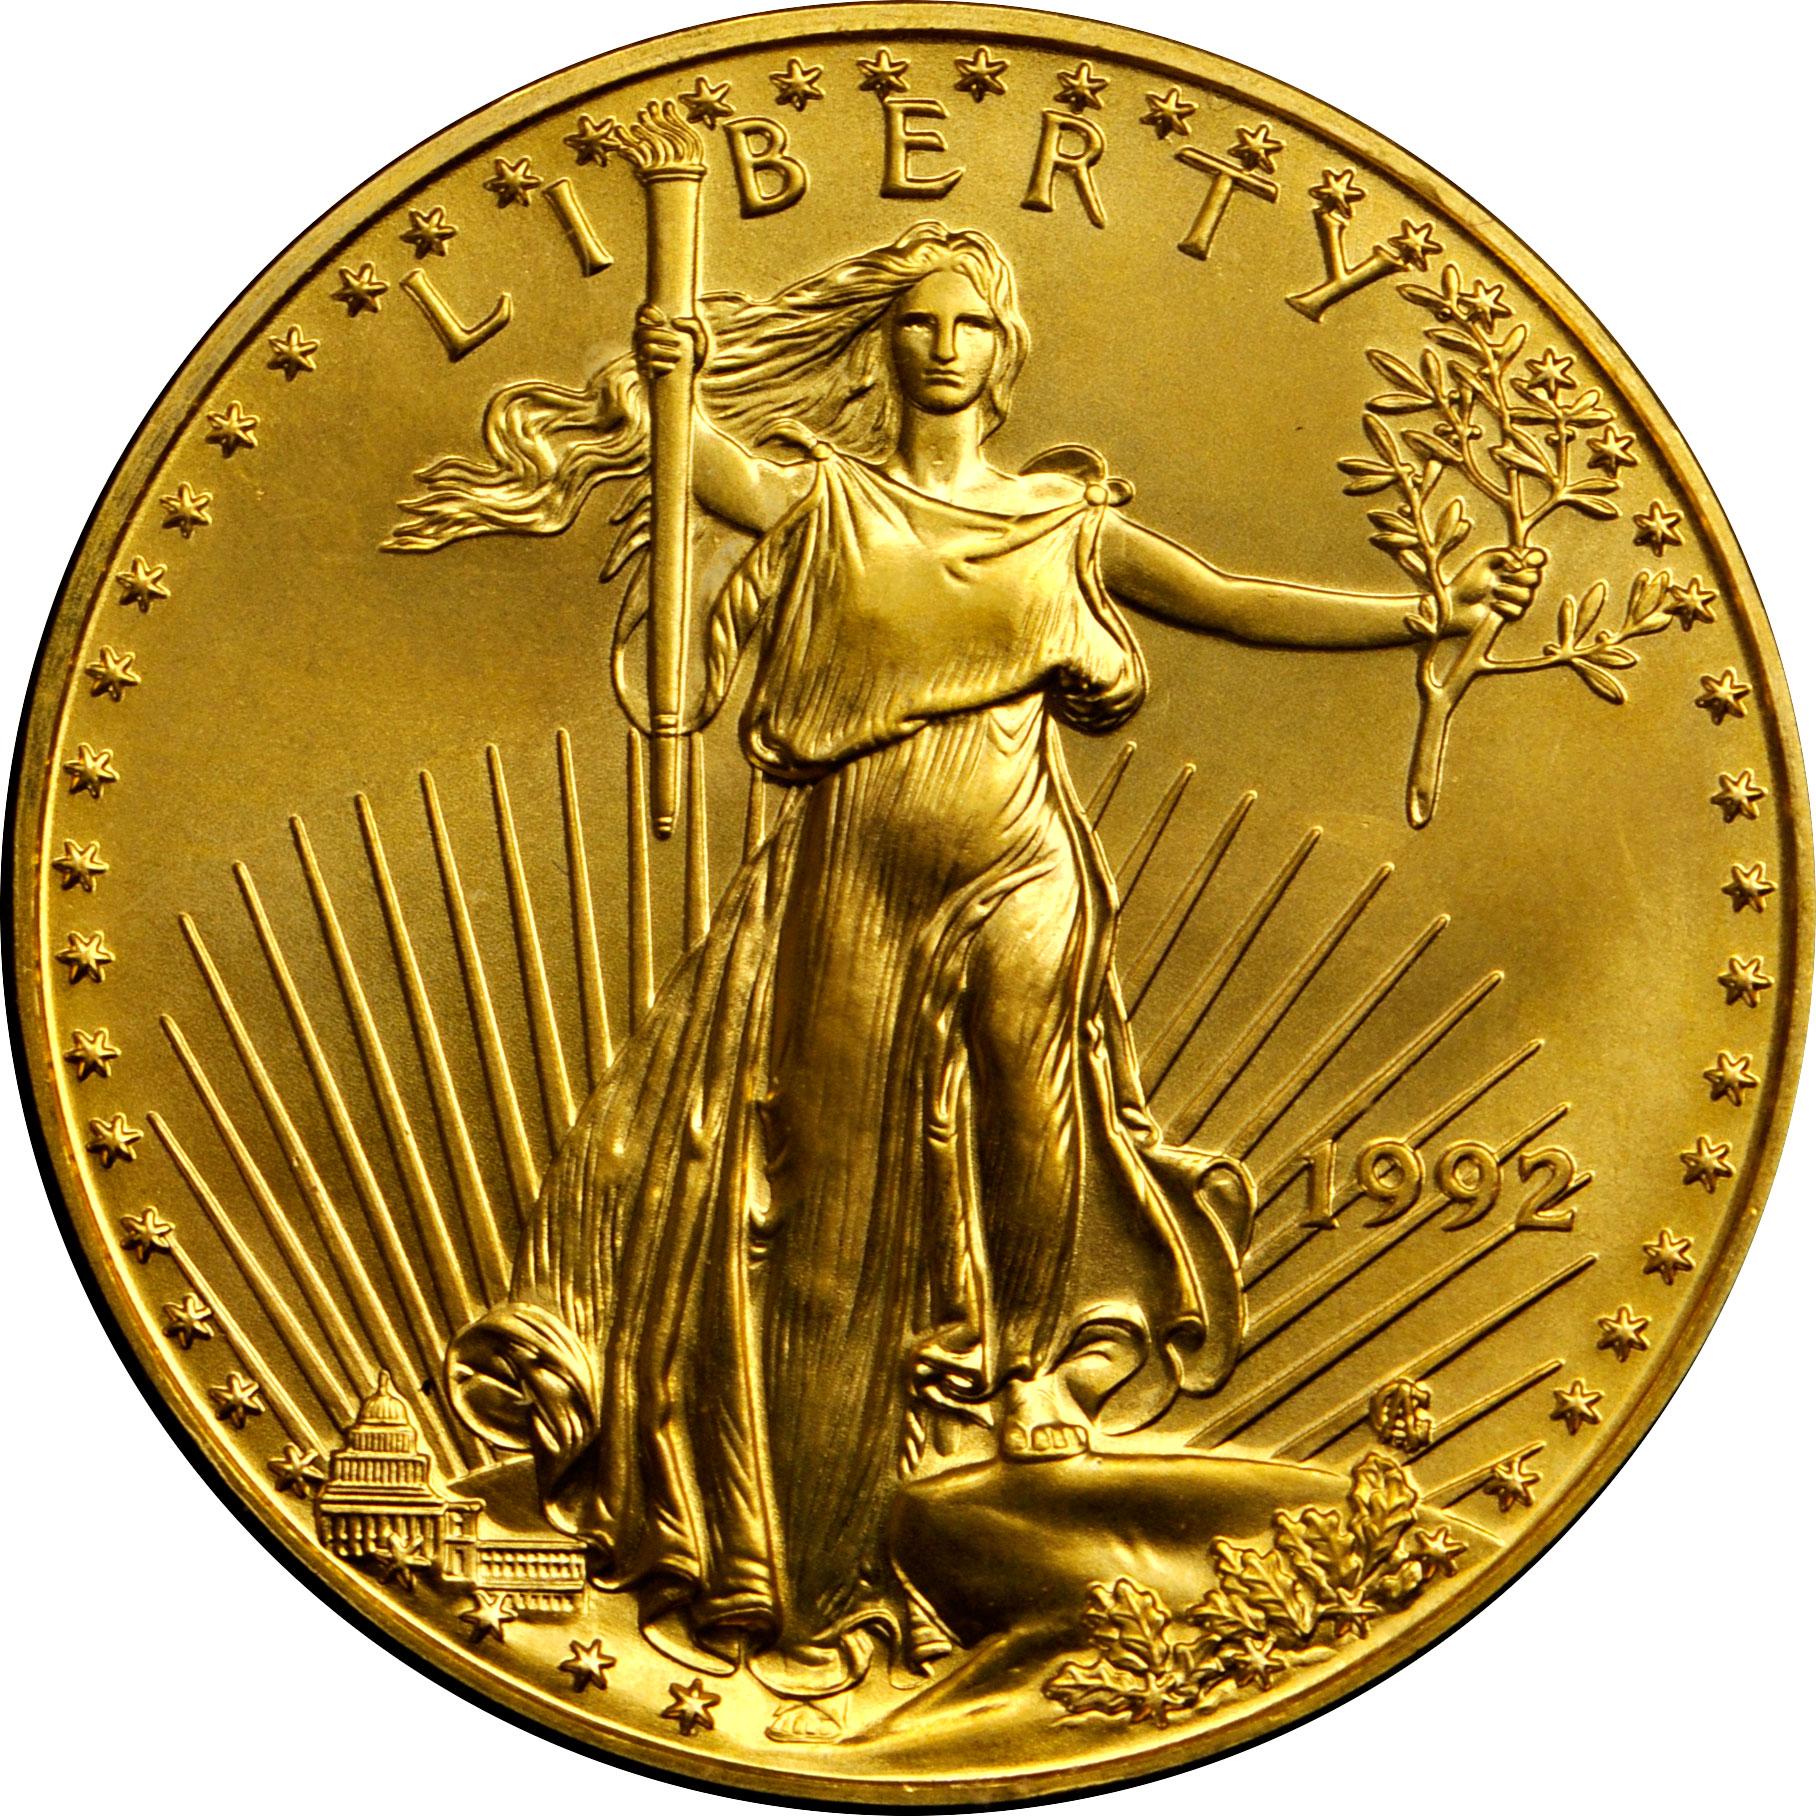 $5 gold coin value